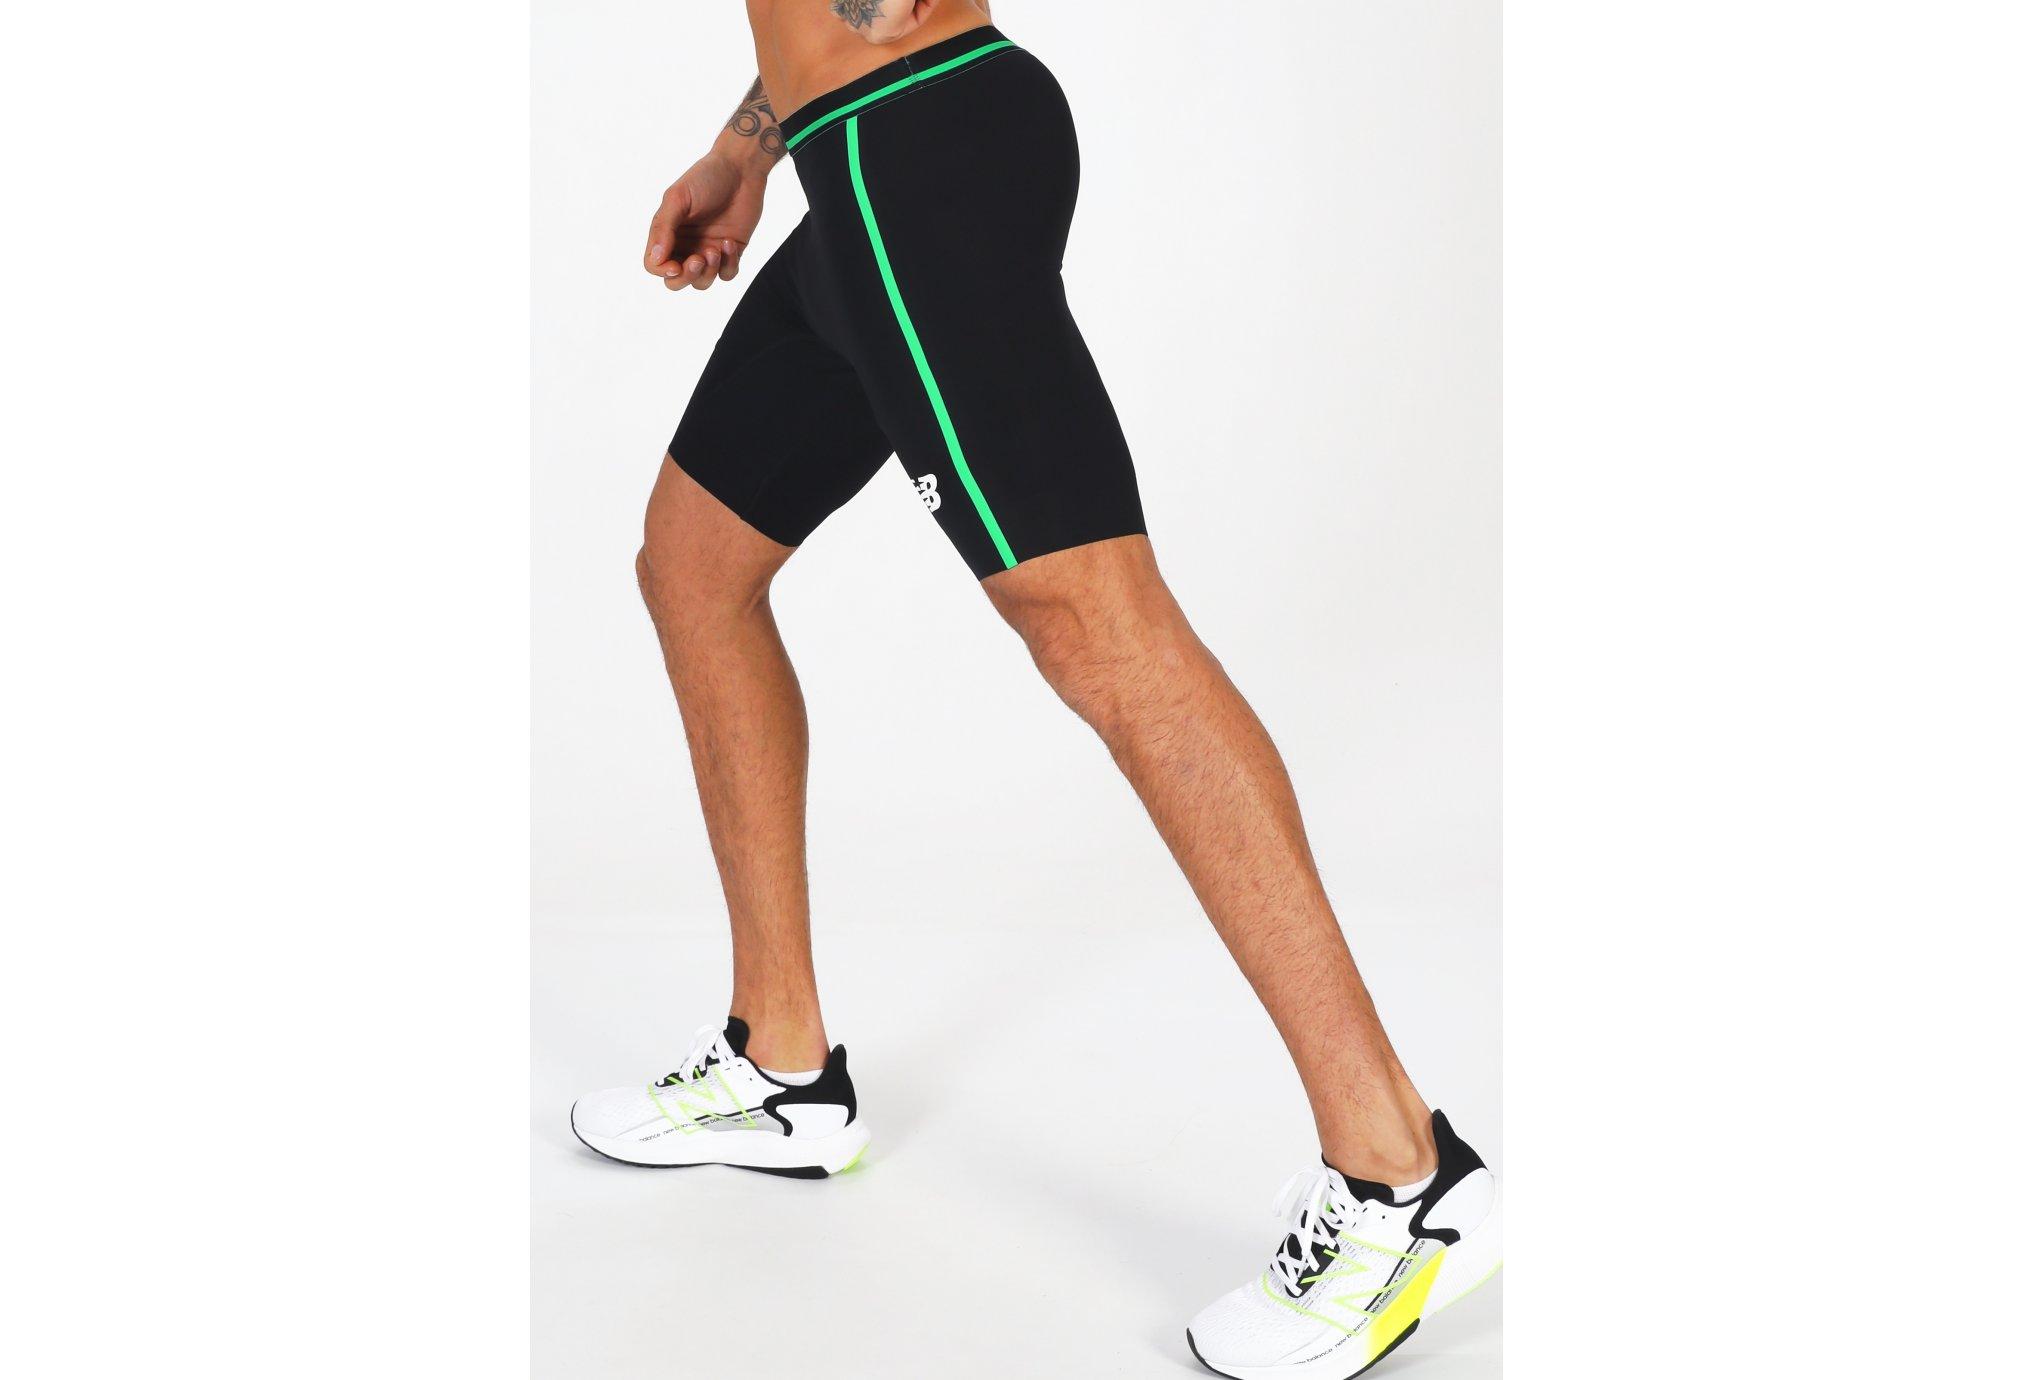 New Balance Prodigy Team Elite M vêtement running homme